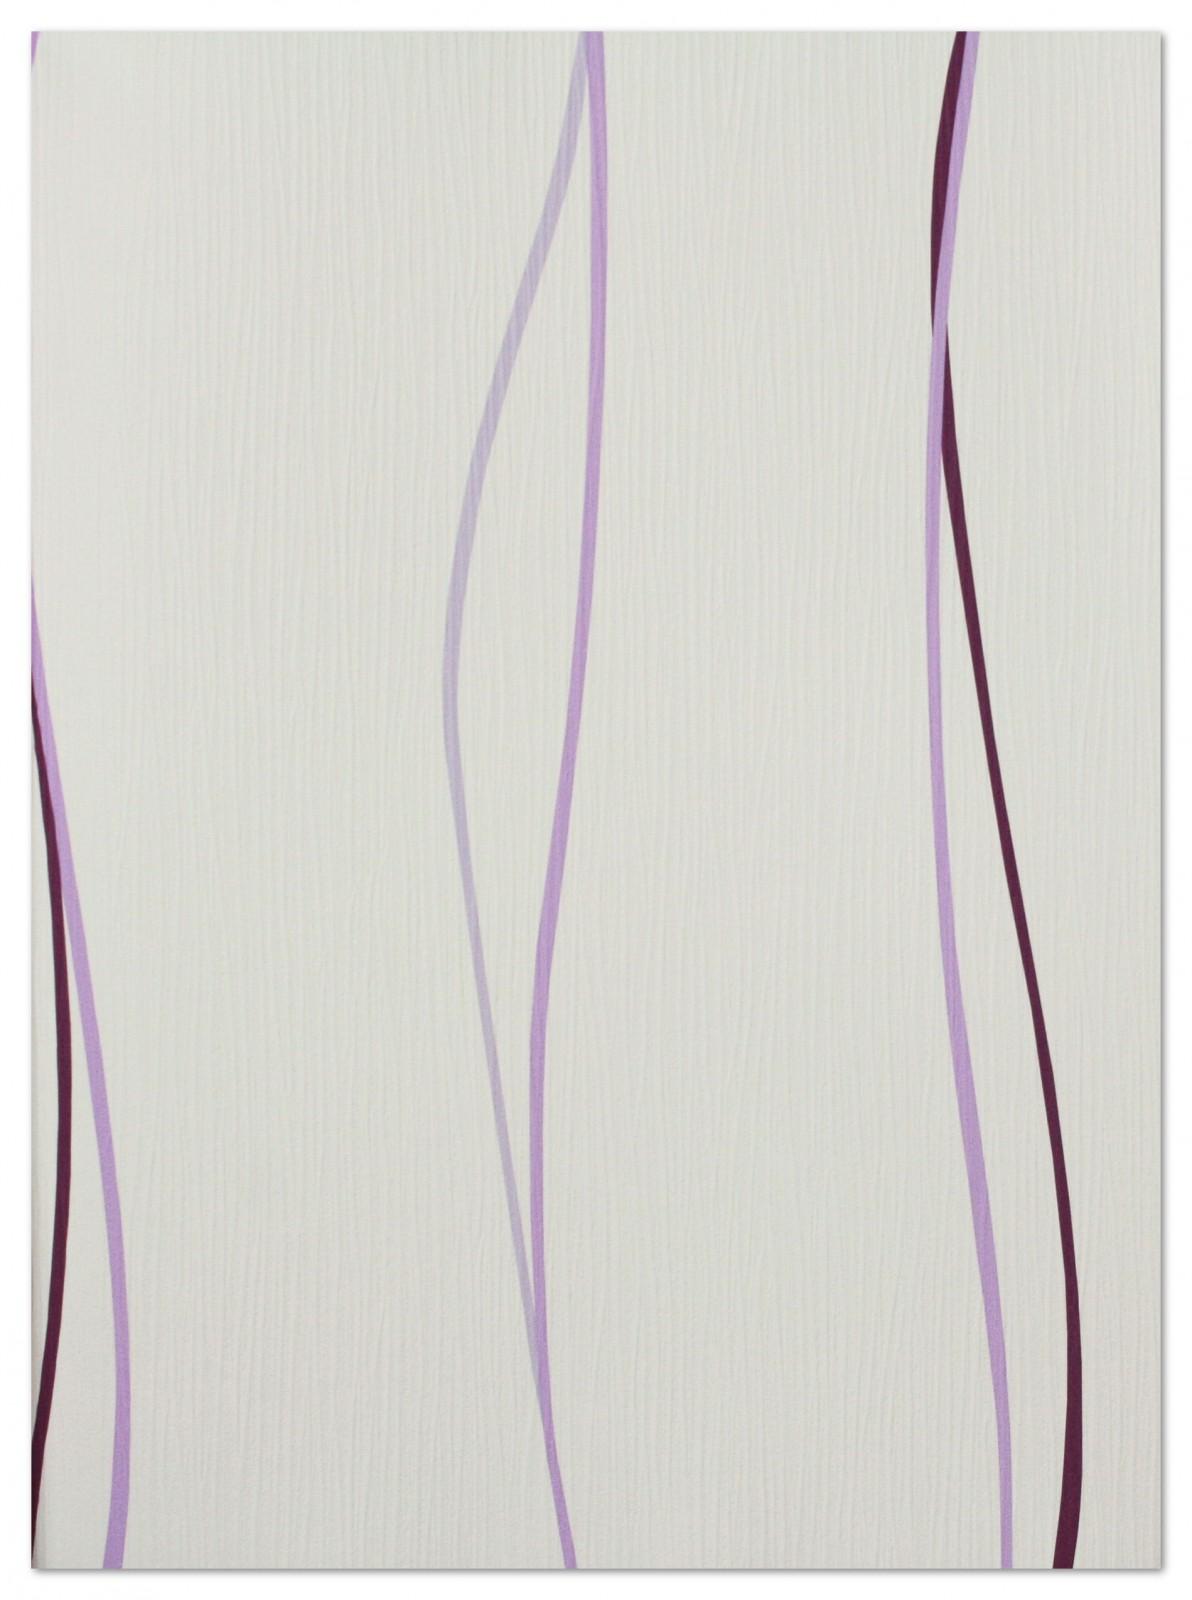 Tapete Springtime 3 Streifen 8769-28 876928 lila weiß